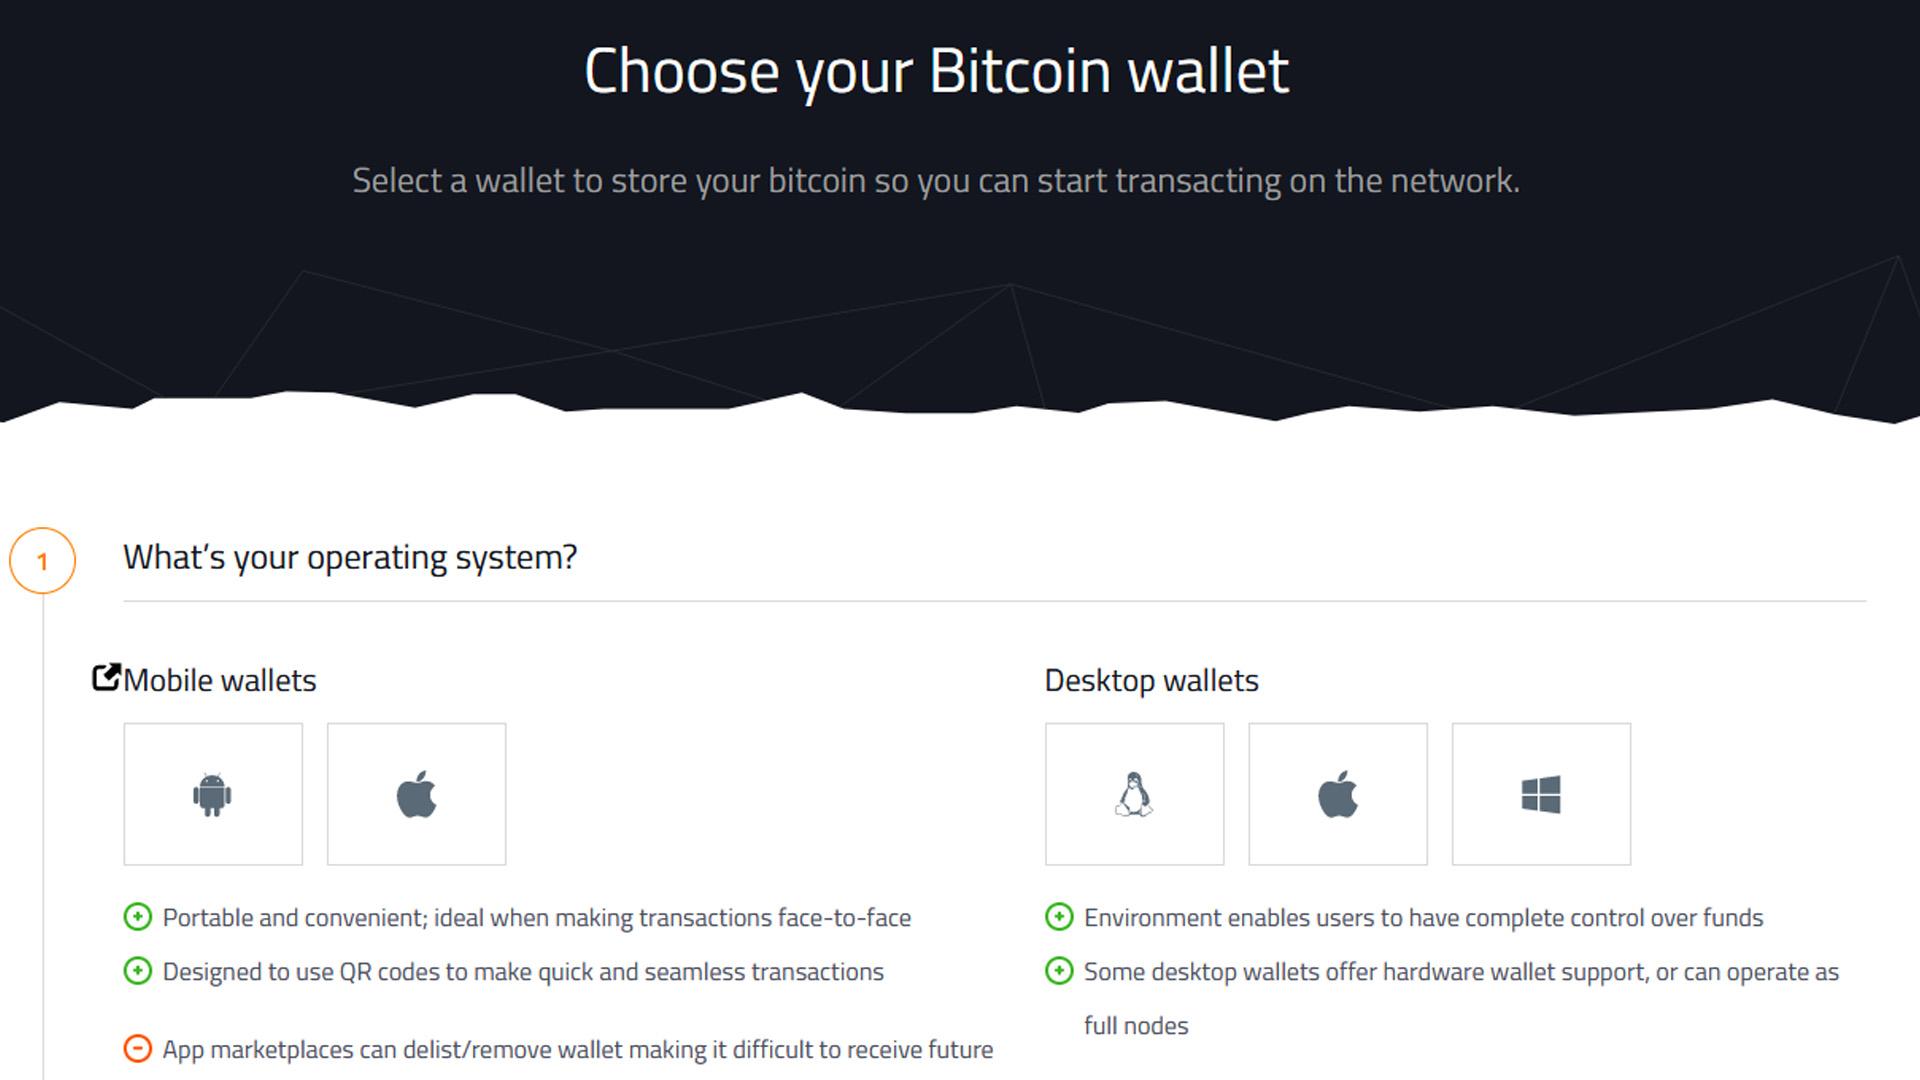 Choose your Bitcoin wallet